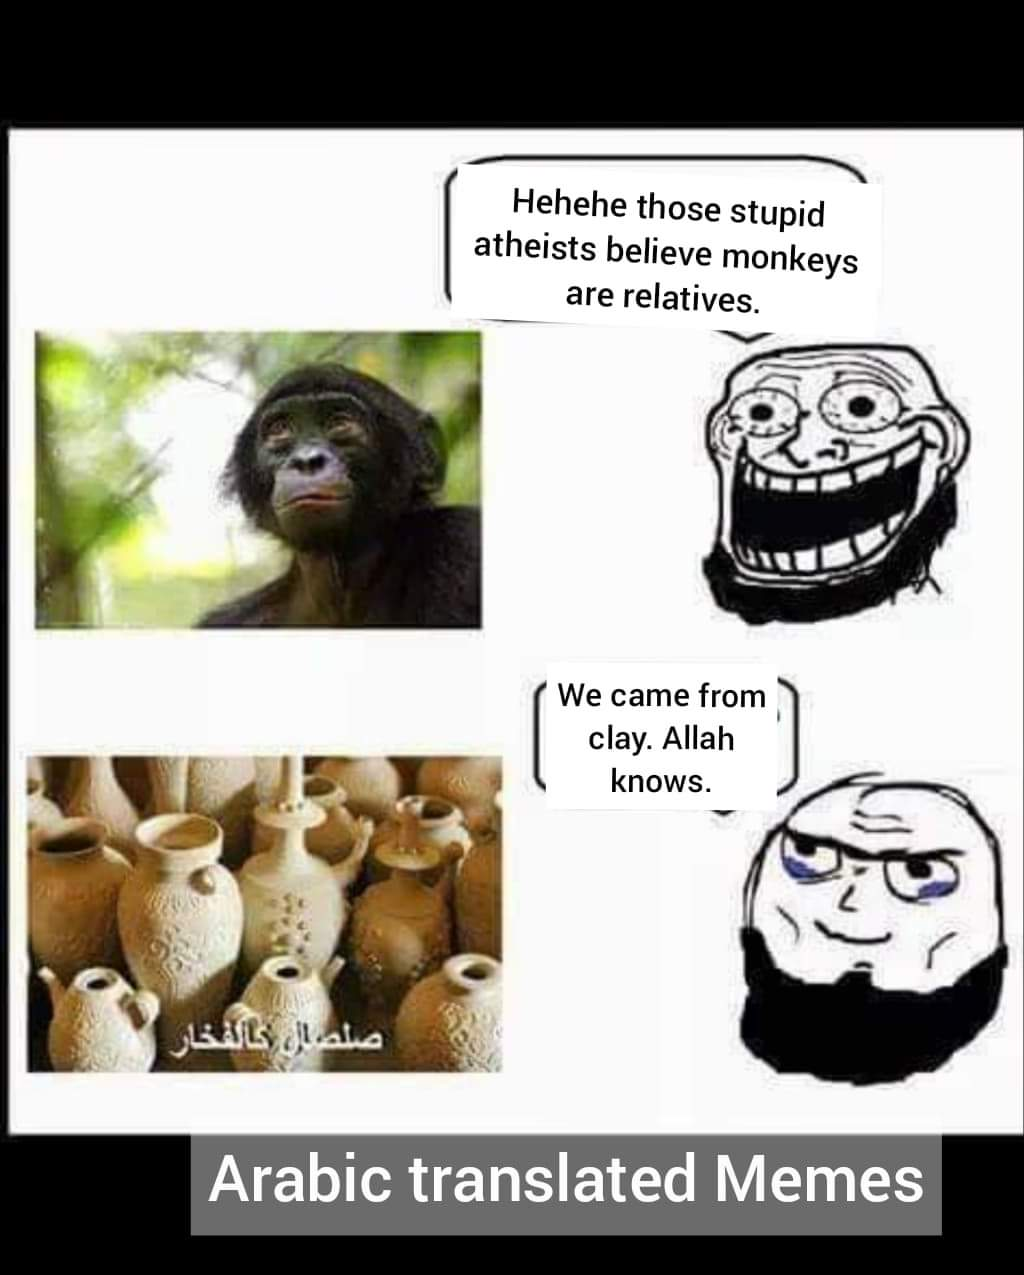 human evolution monkeys primates atheists clay dirt quran Islam